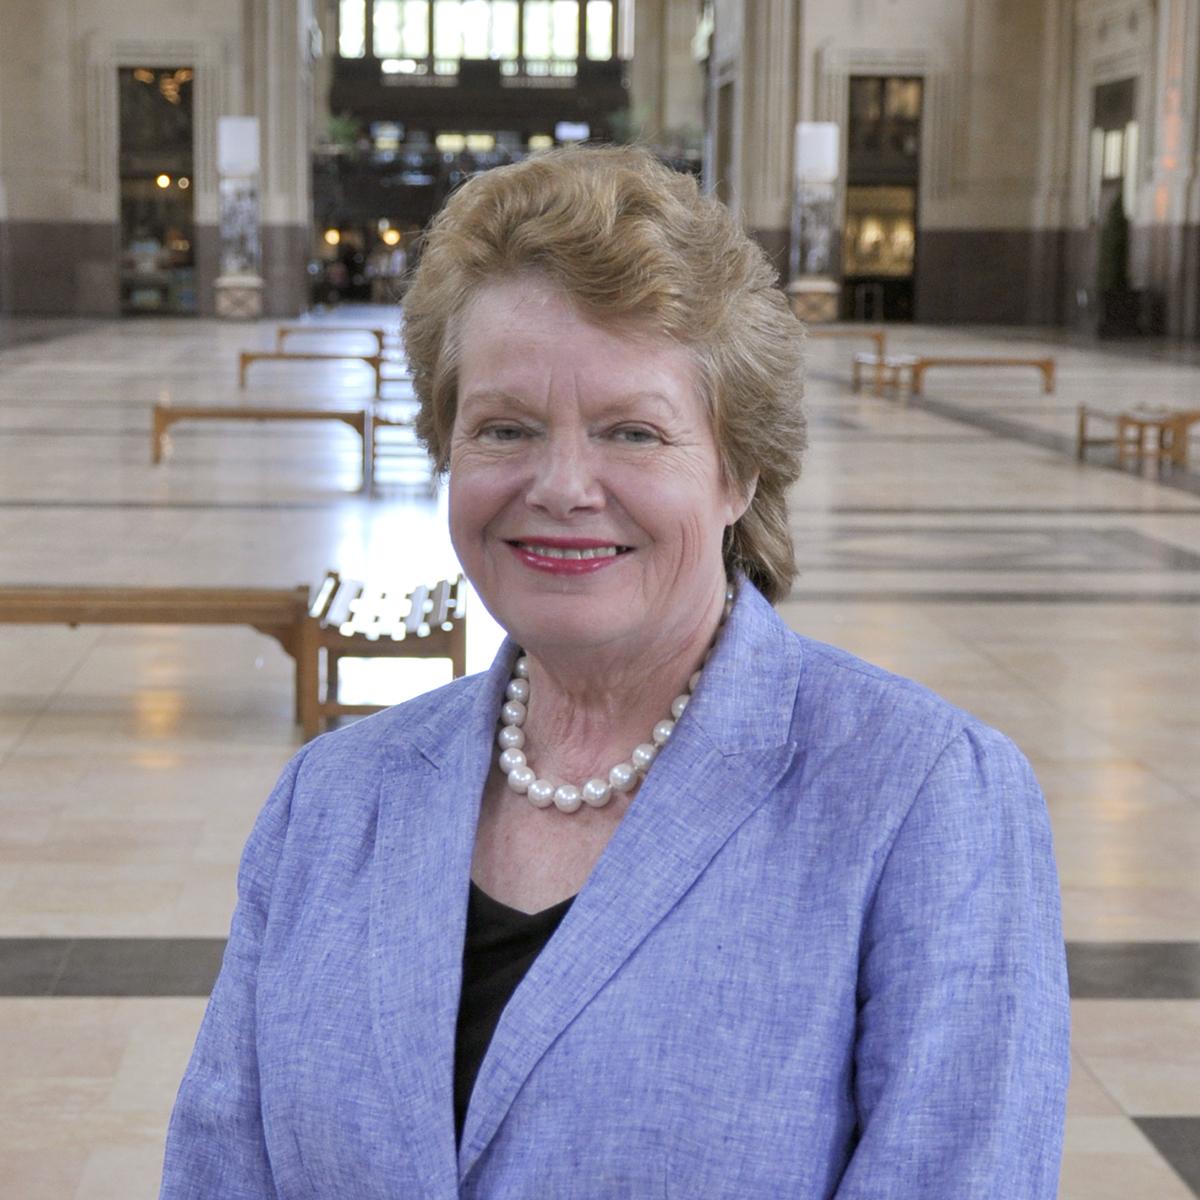 Representative Judy Morgan